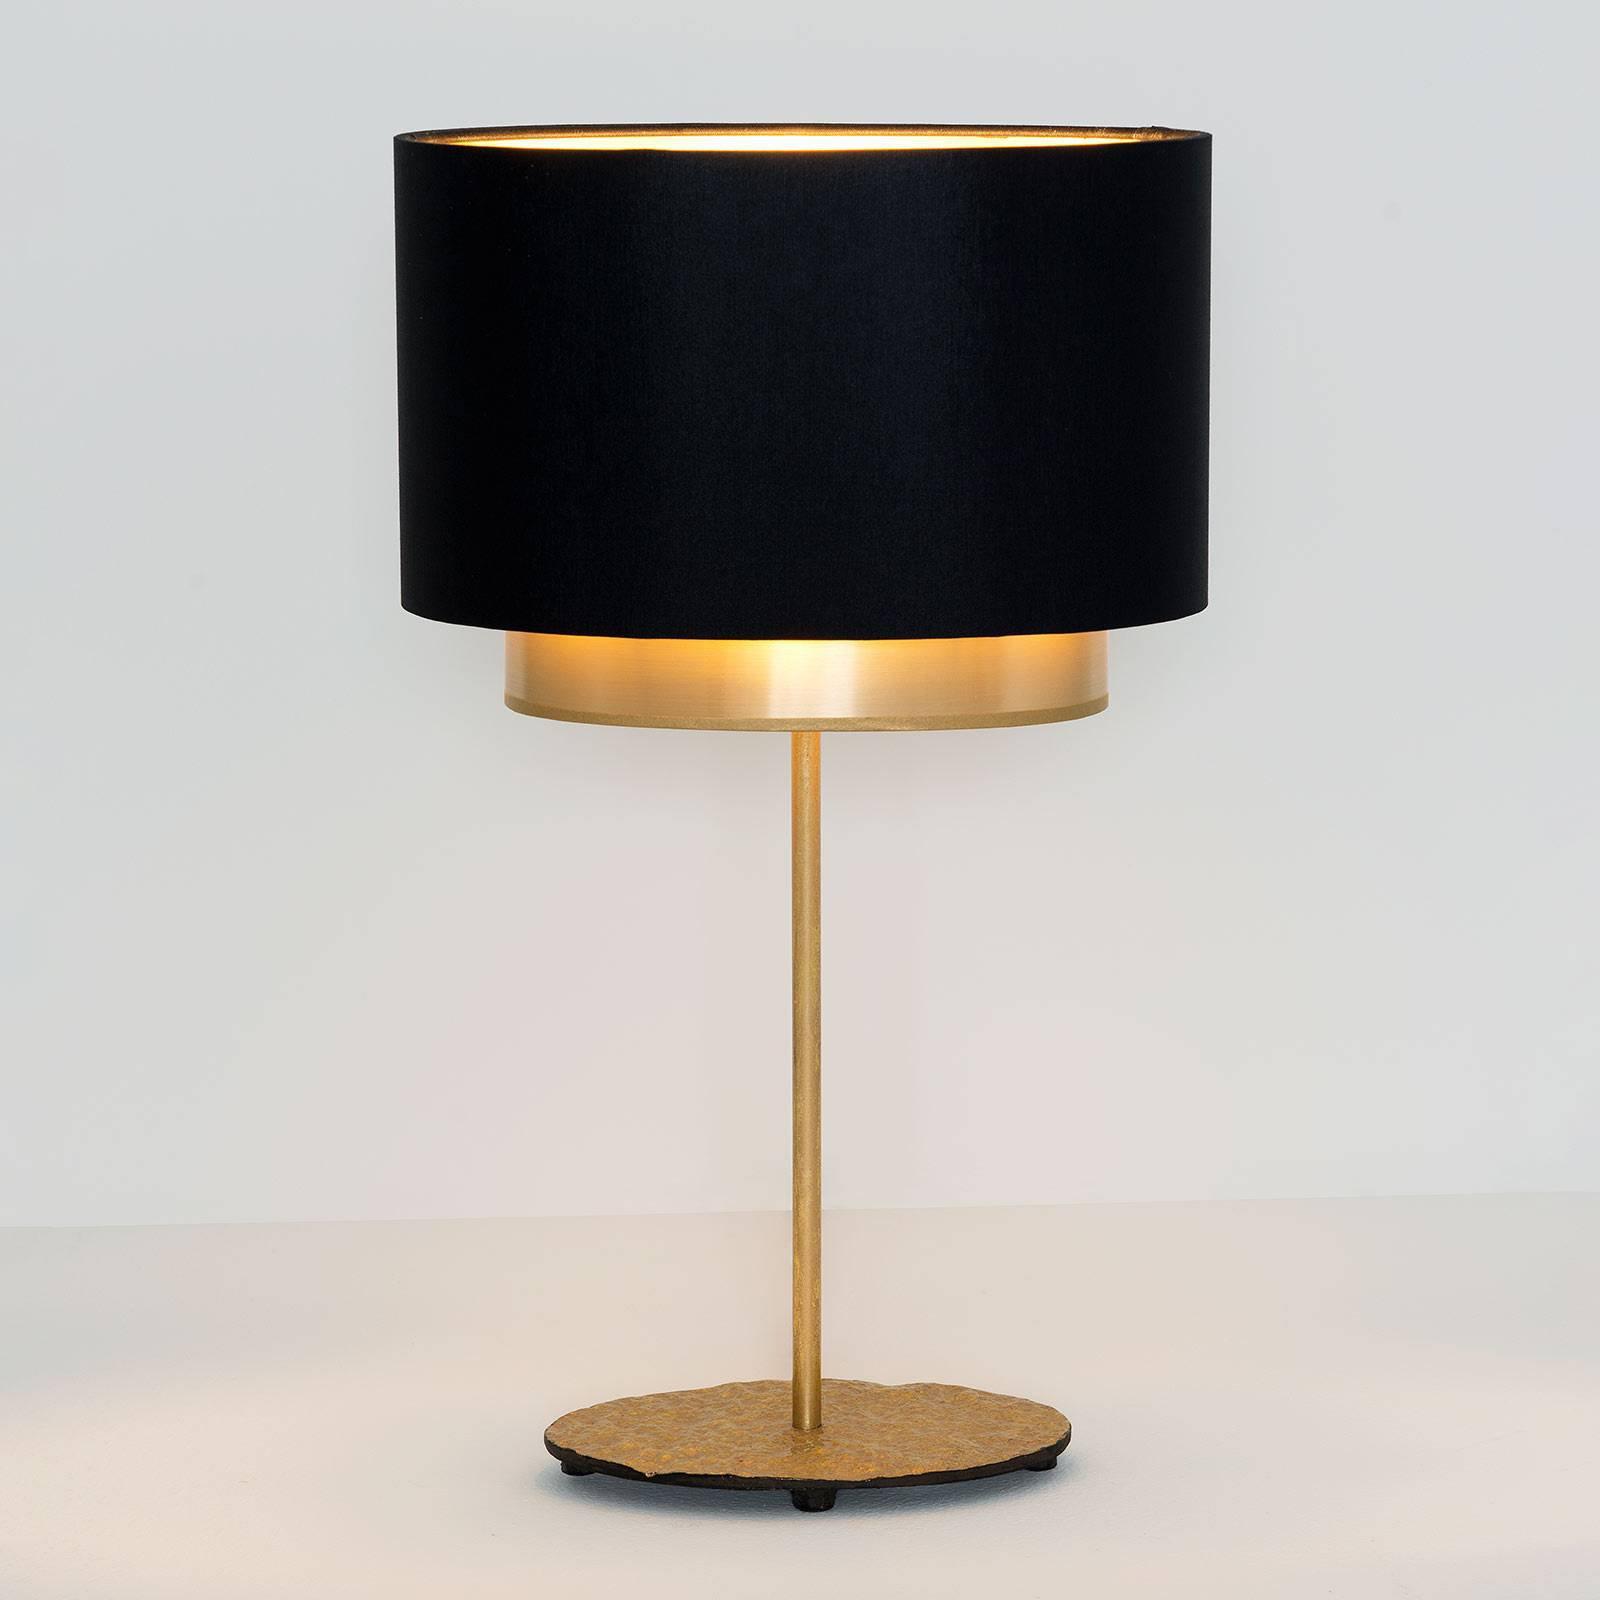 Bordlampe Mattia, oval, dobbel, svart/gull